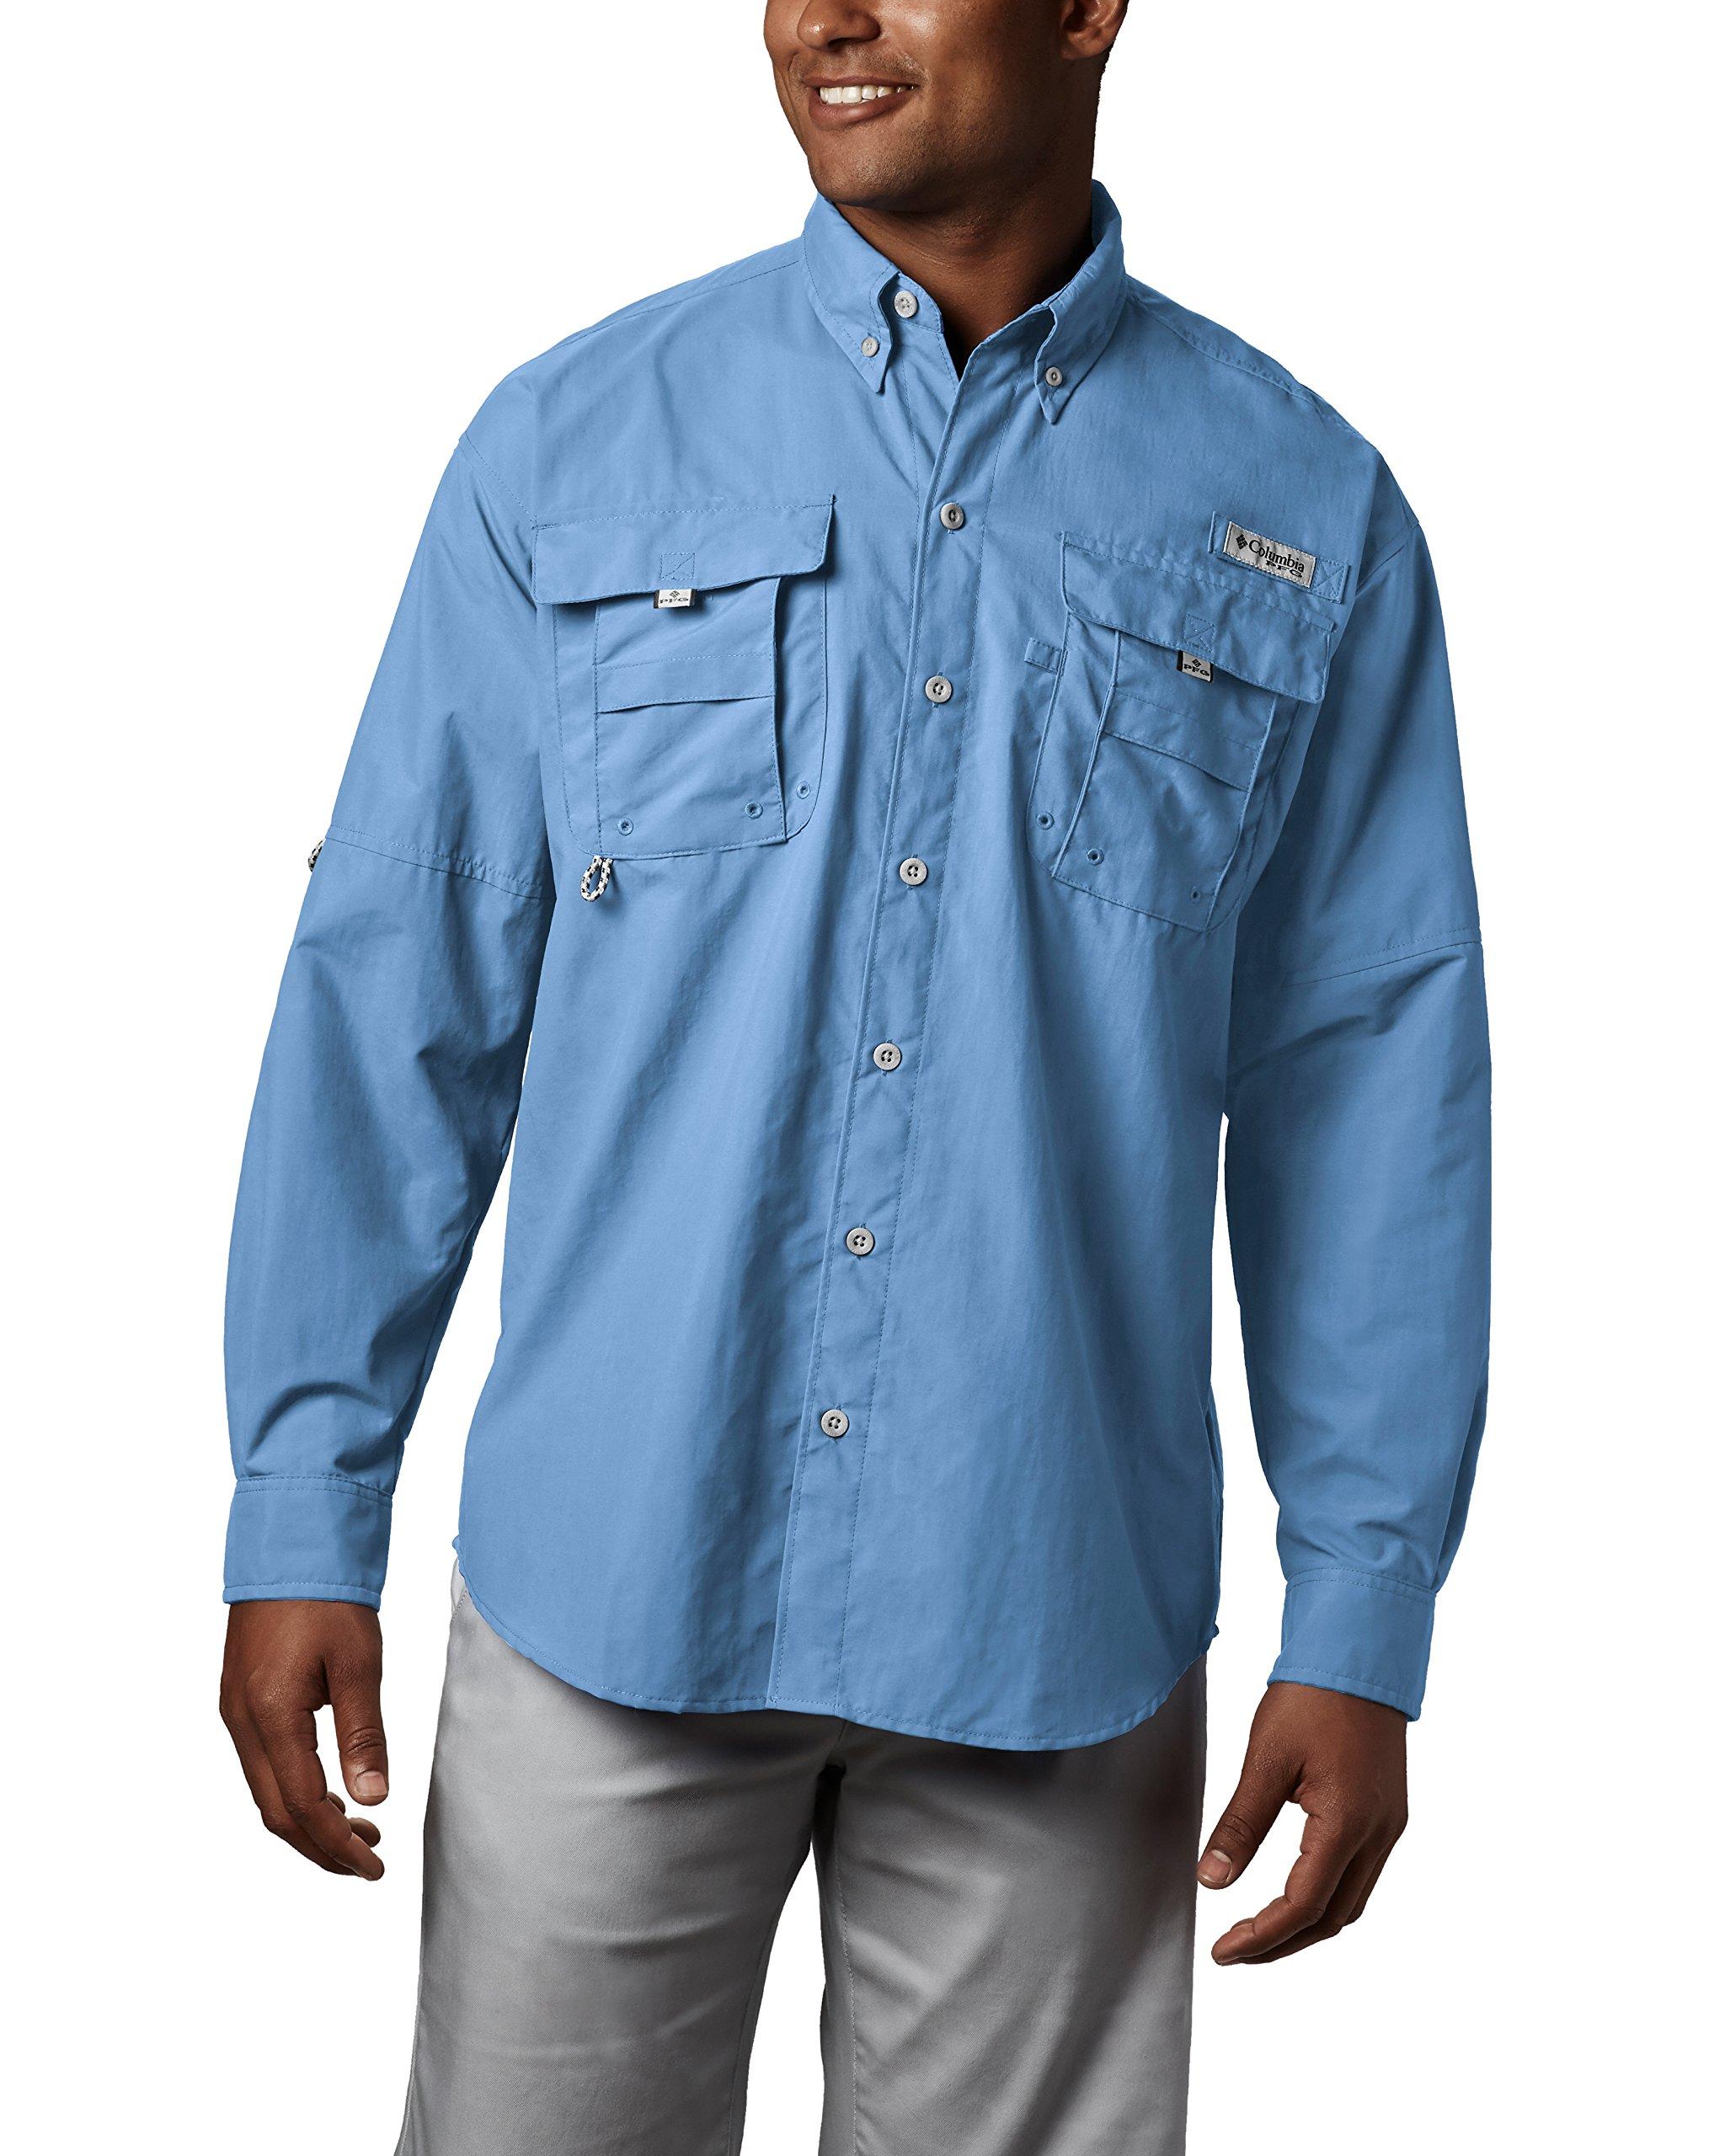 fe818564 Columbia Men's PFG Bahama II Long Sleeve Shirt, Breathable with UV  Protection